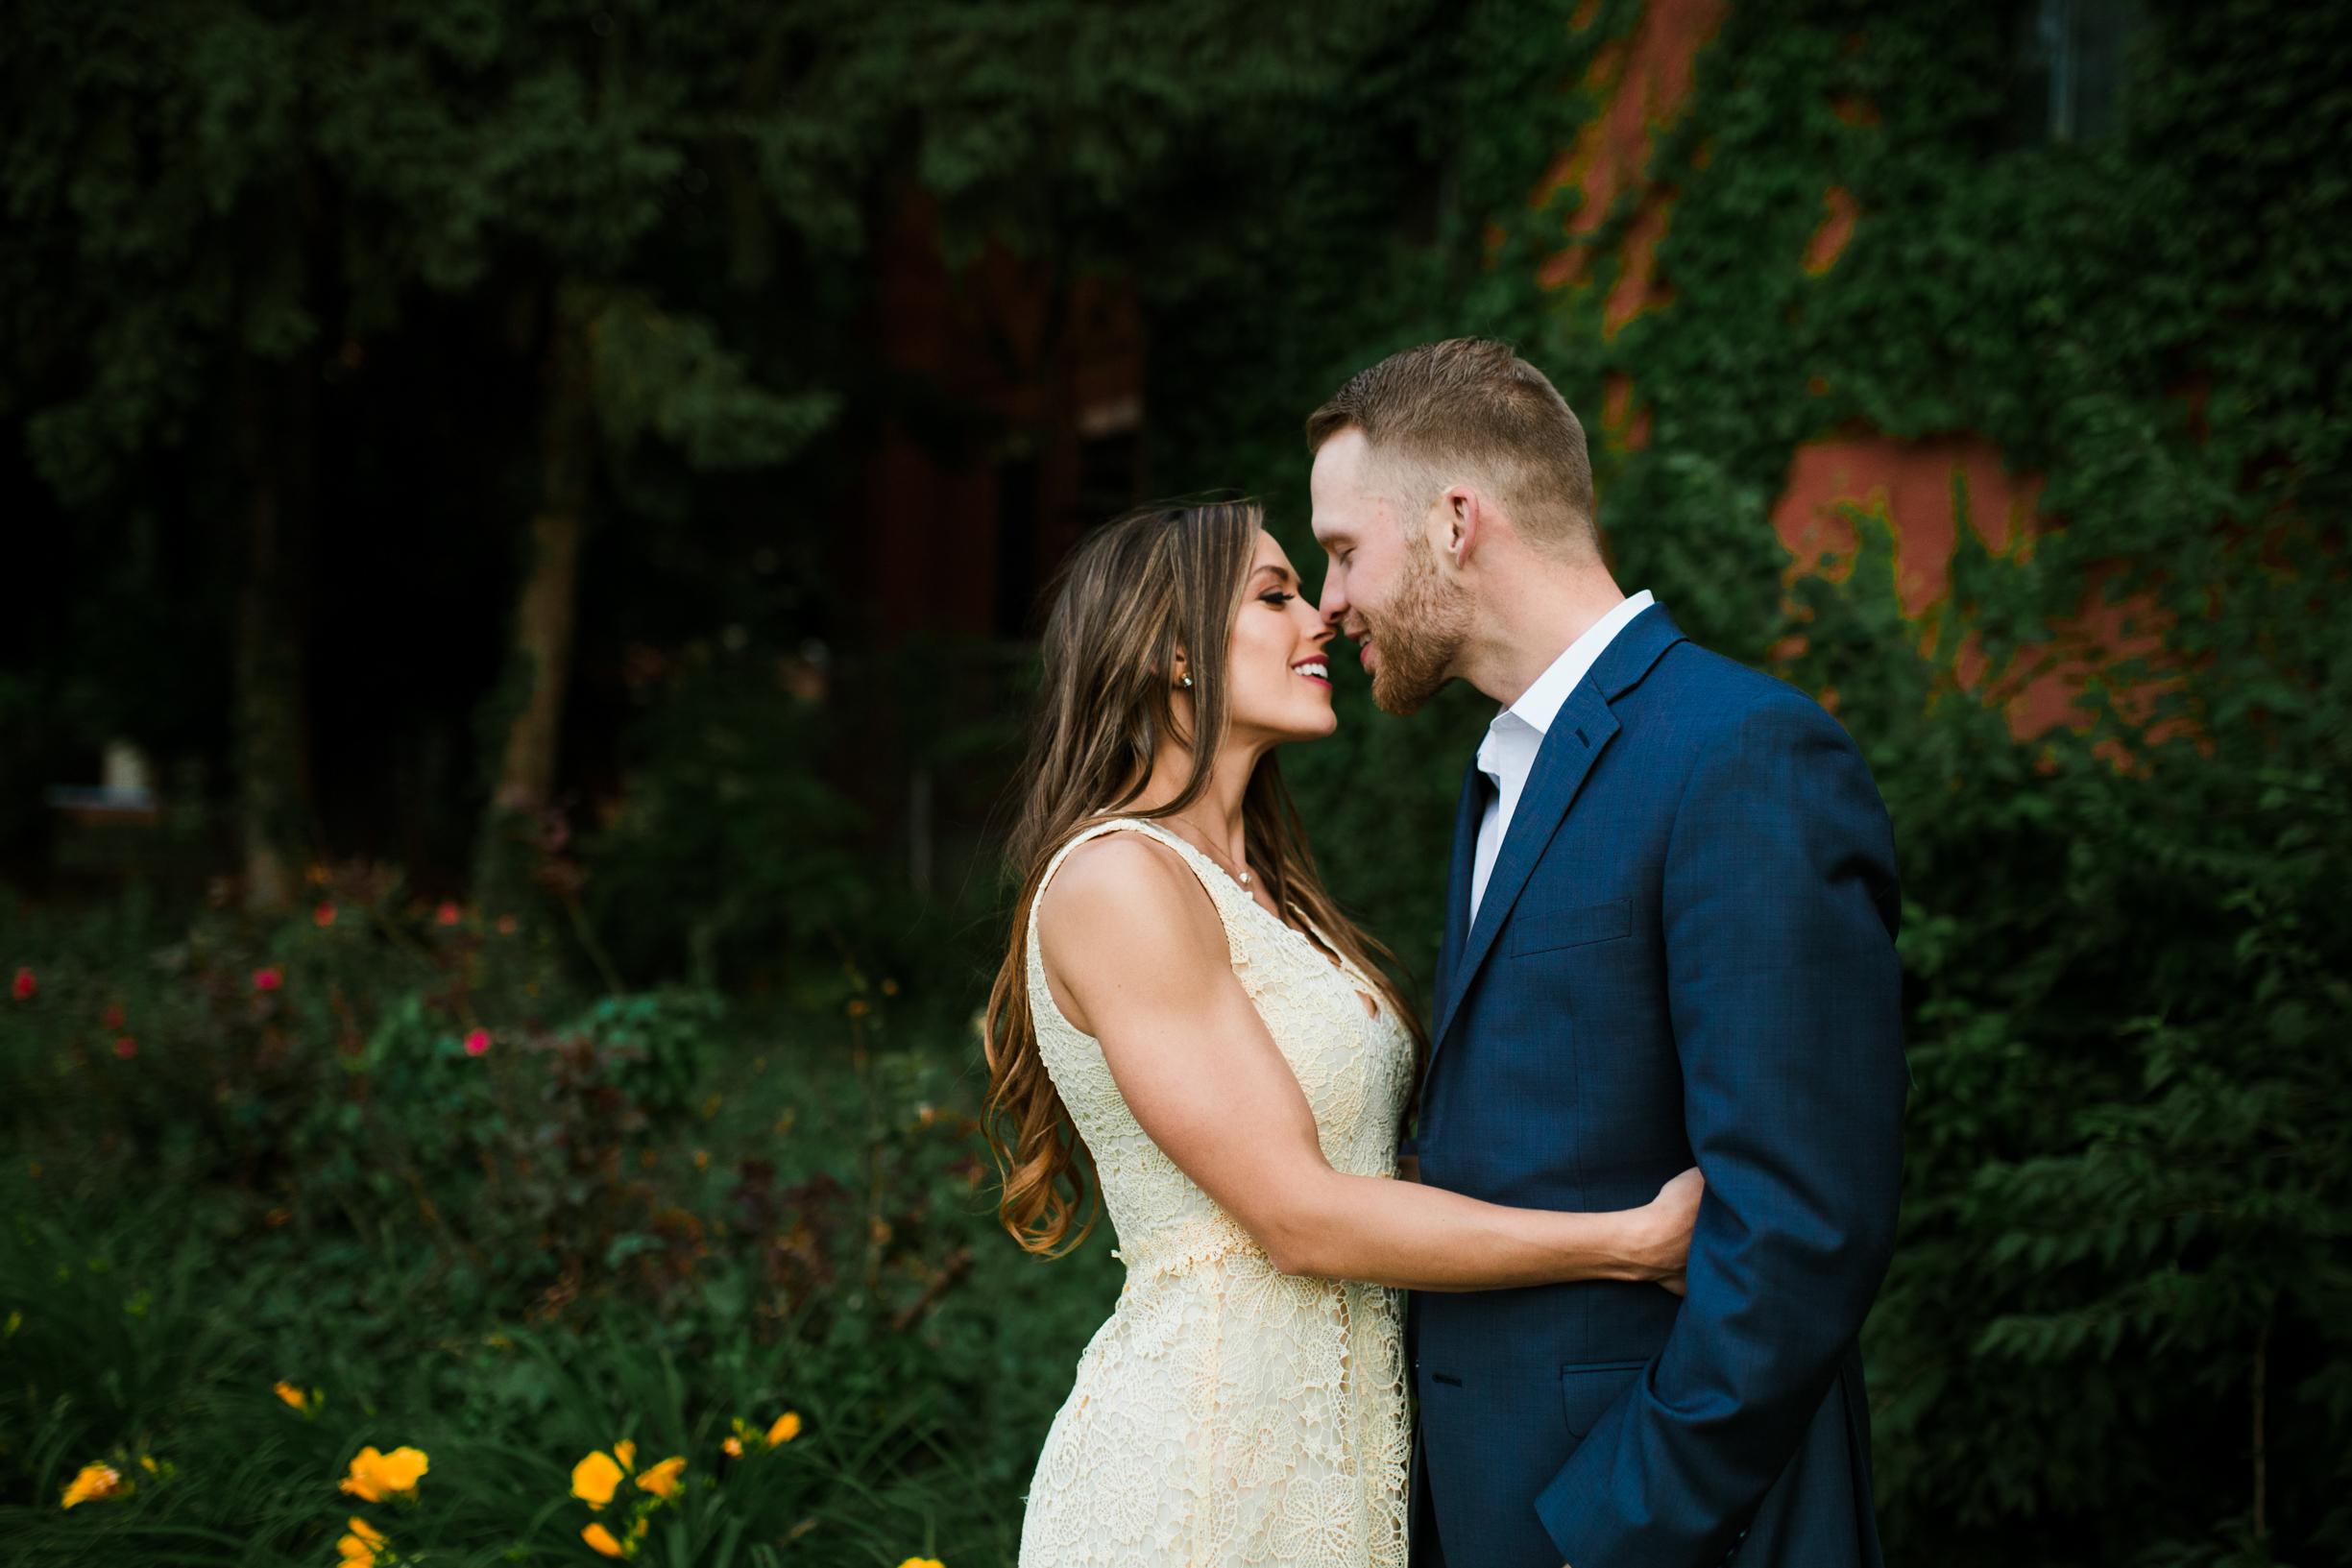 Victoria & Chad Engagement 2018 Crystal Ludwick Photo Louisville Kentucky Wedding Photographer WEBSITE (34 of 48).jpg